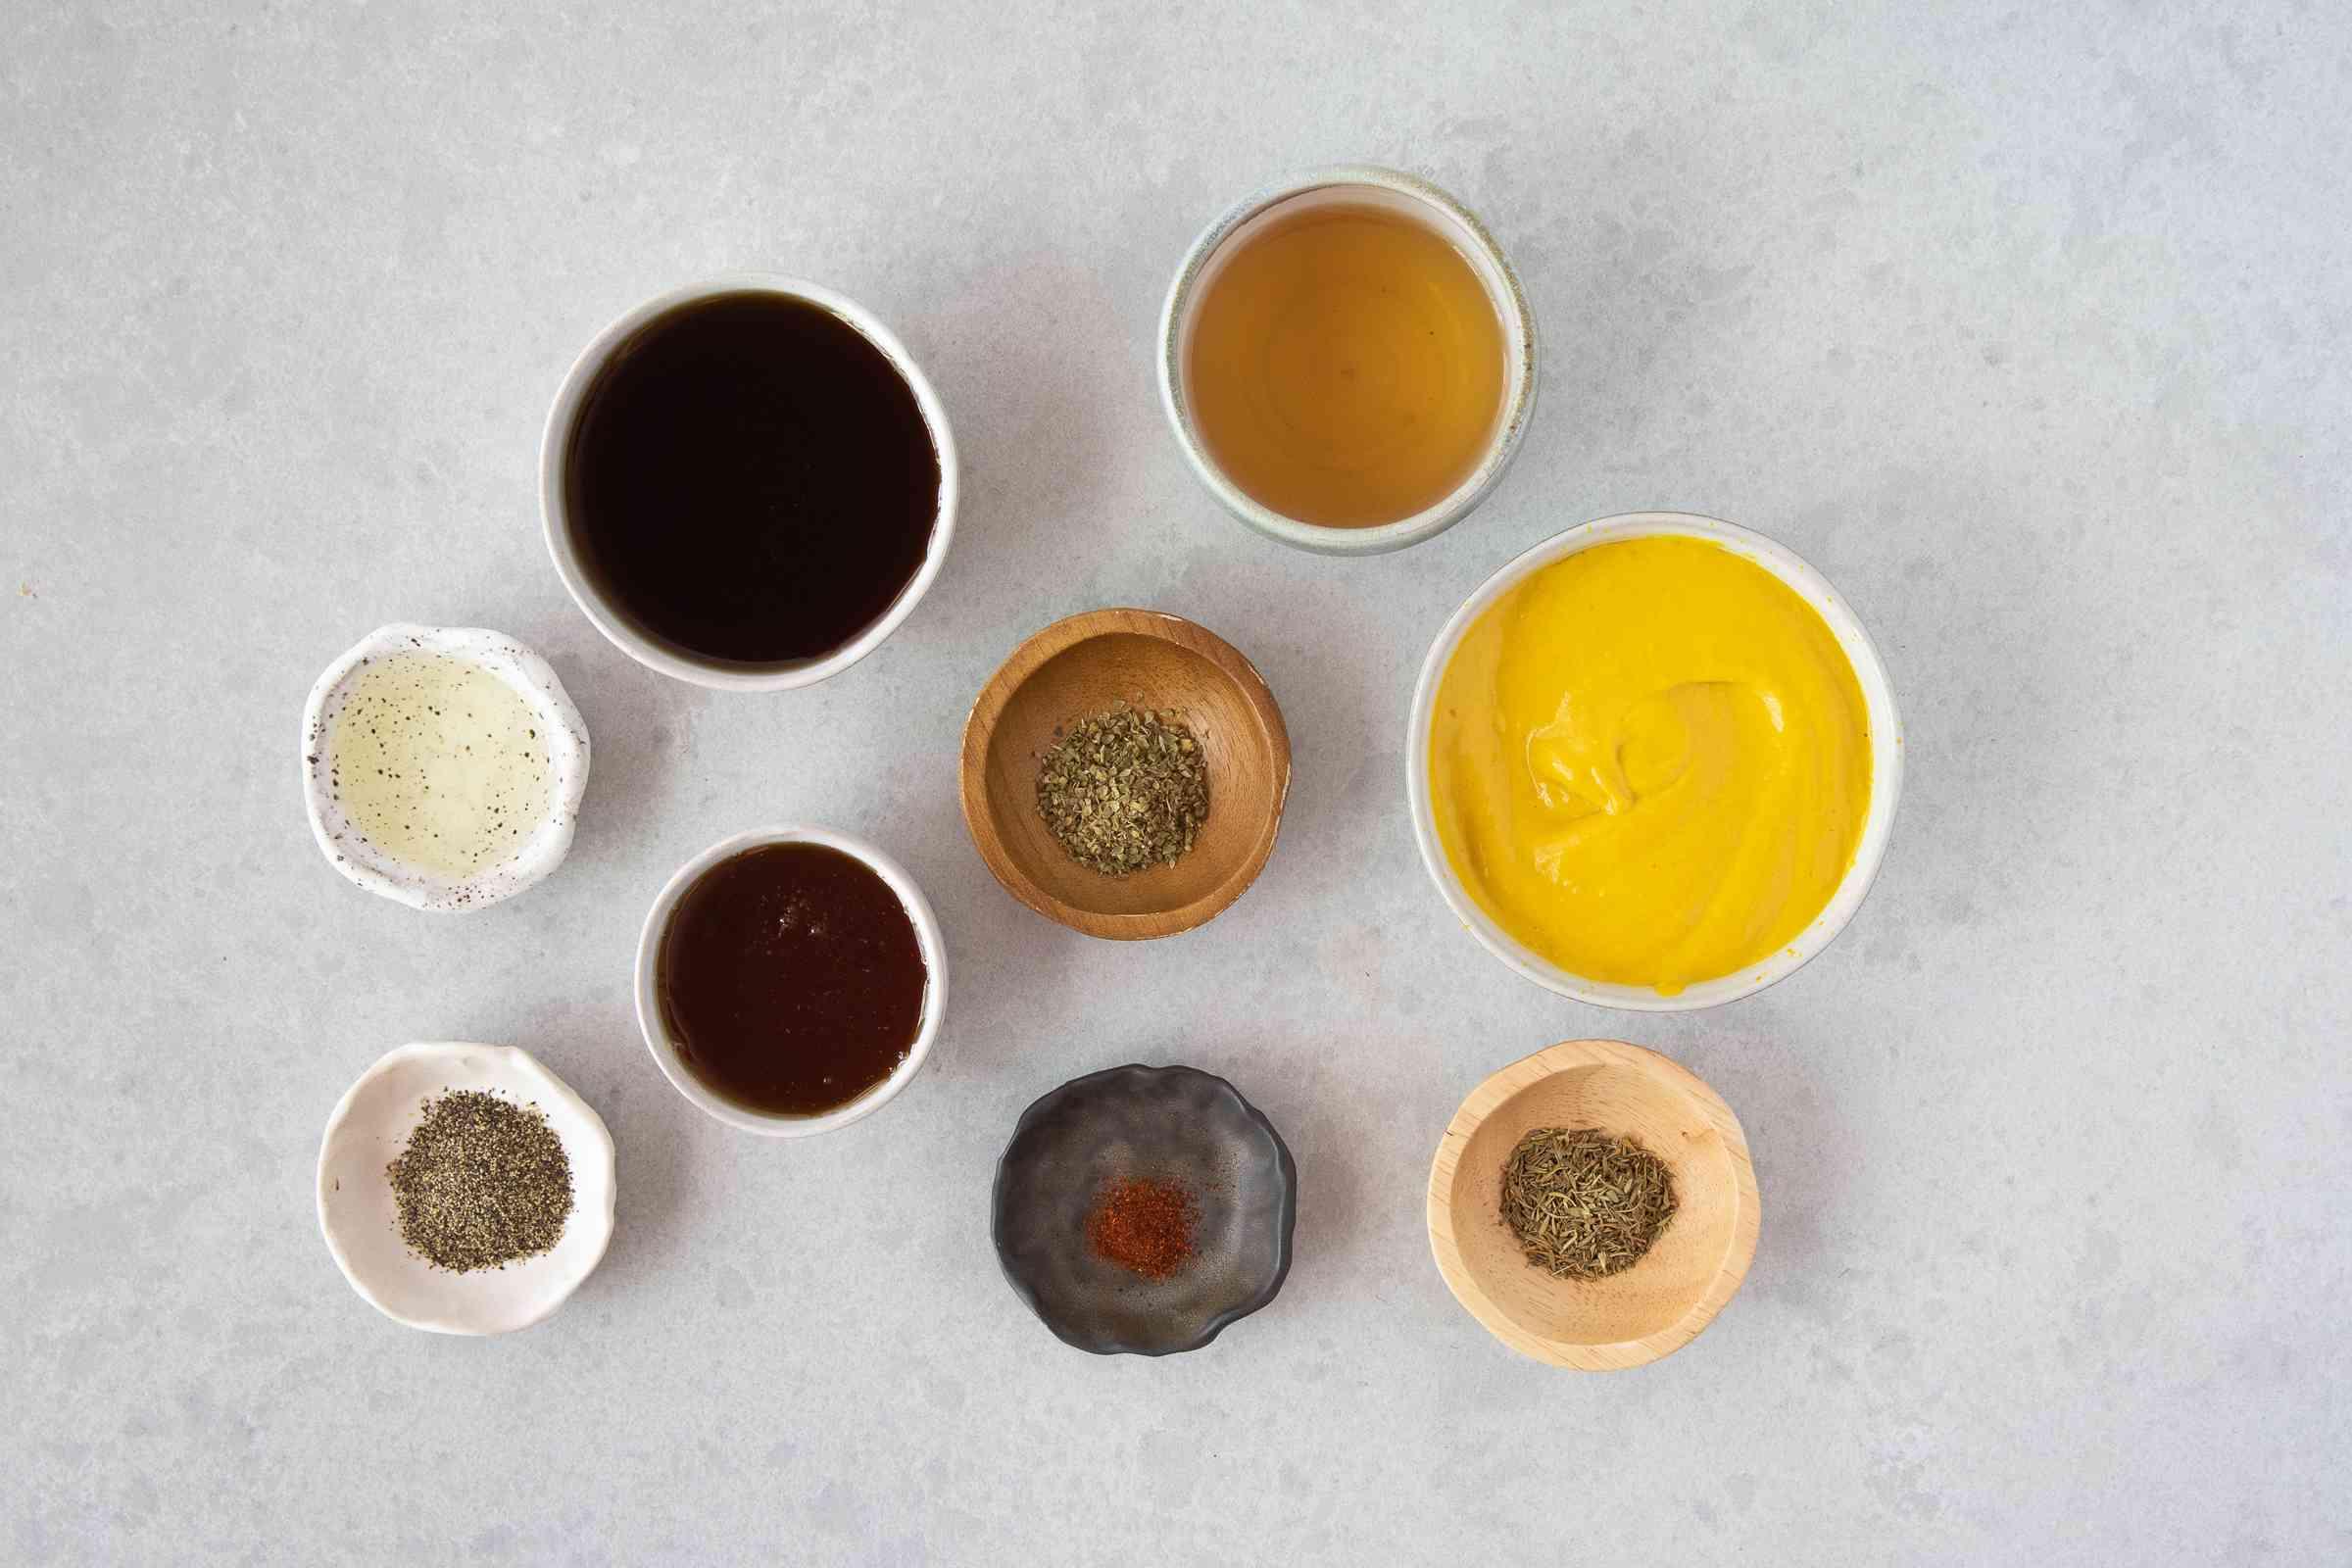 Savory 'n Sweet Mustard Sauce ingredients